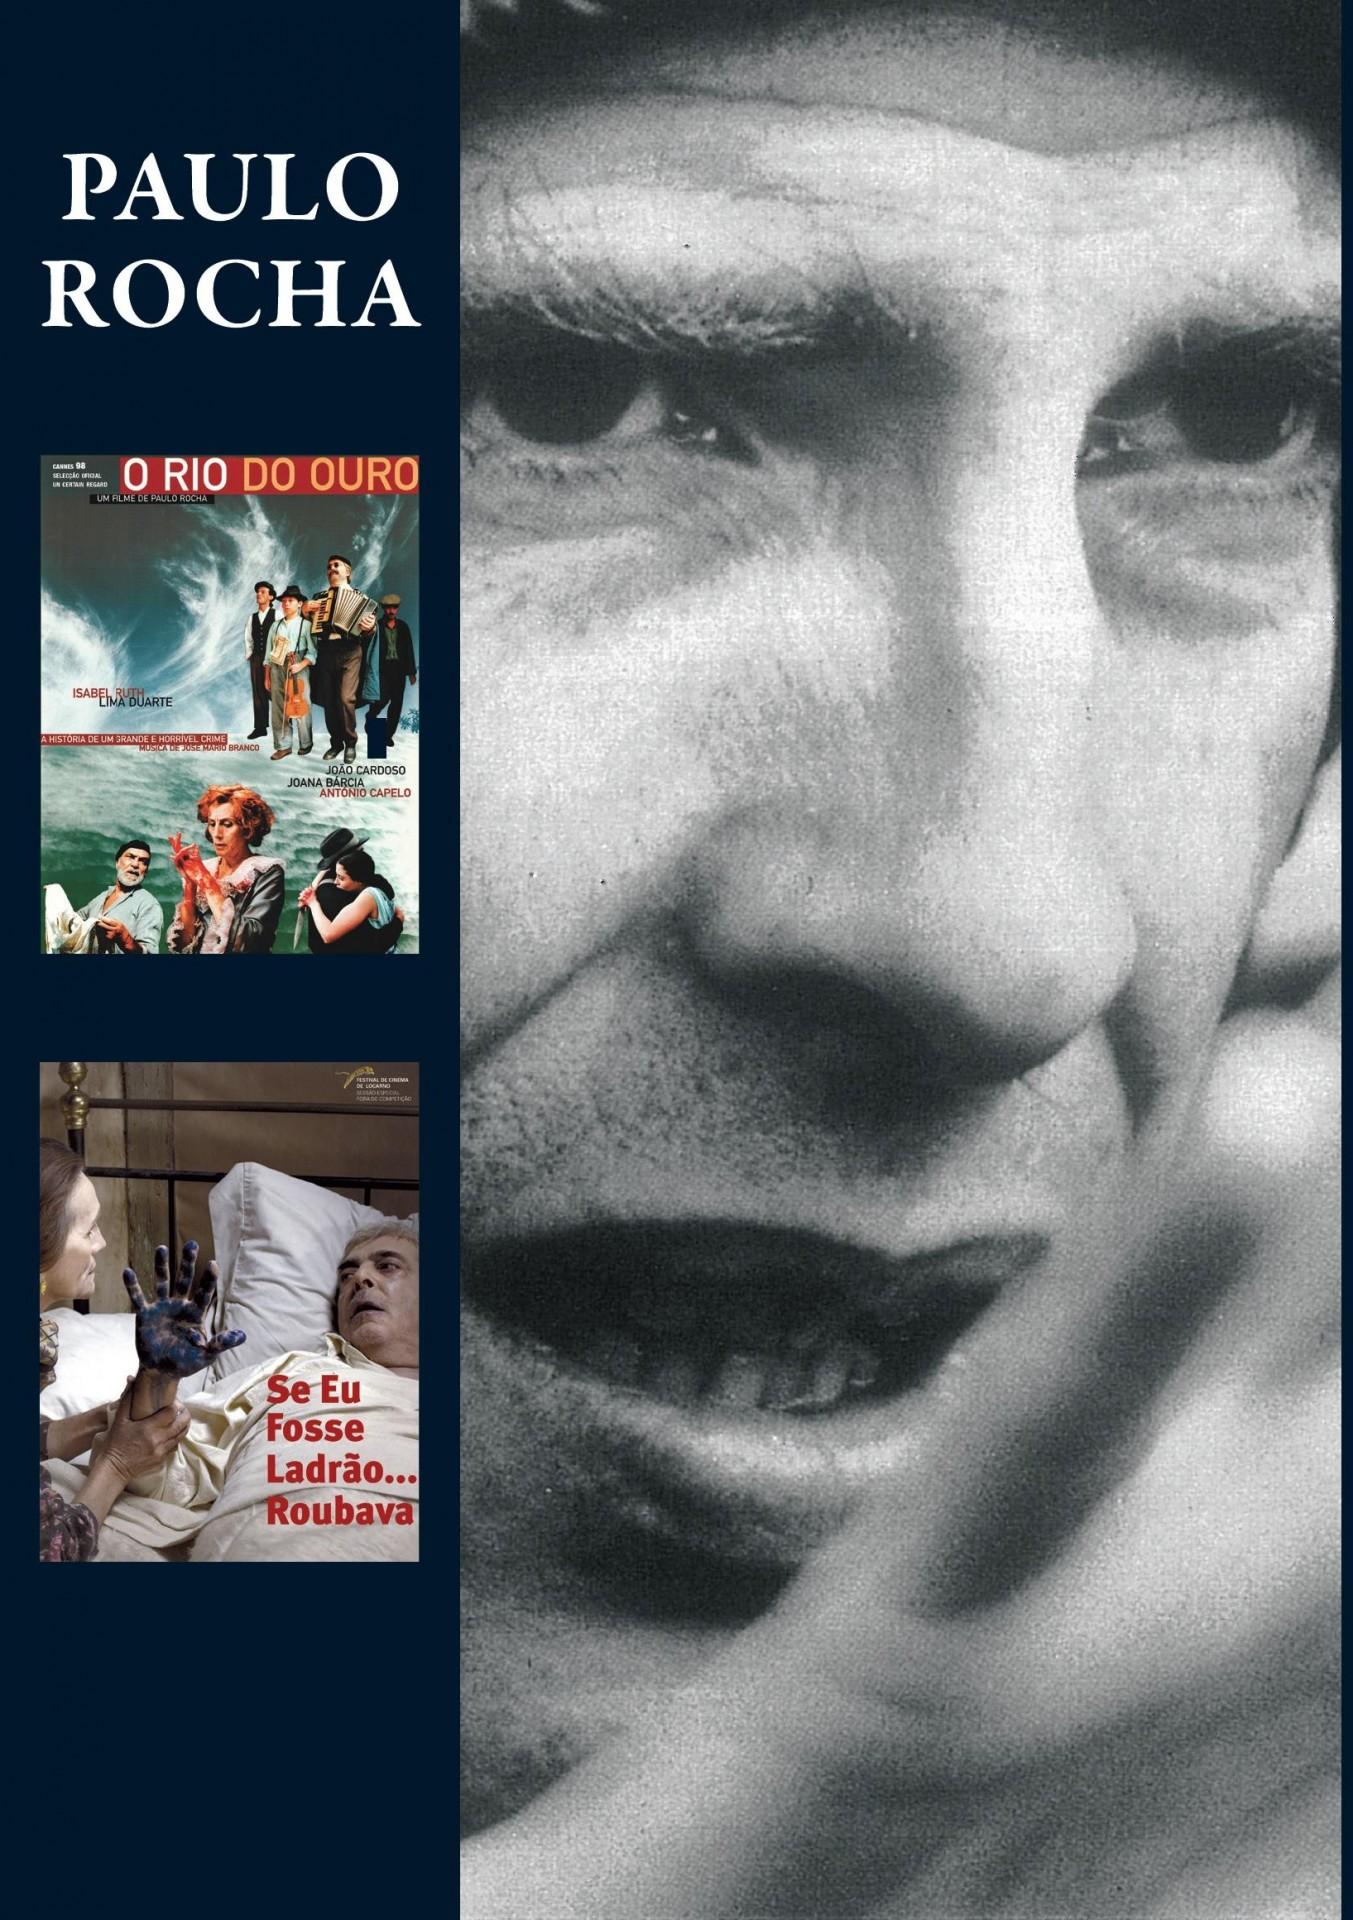 Paulo Rocha: edição de coleccionador II